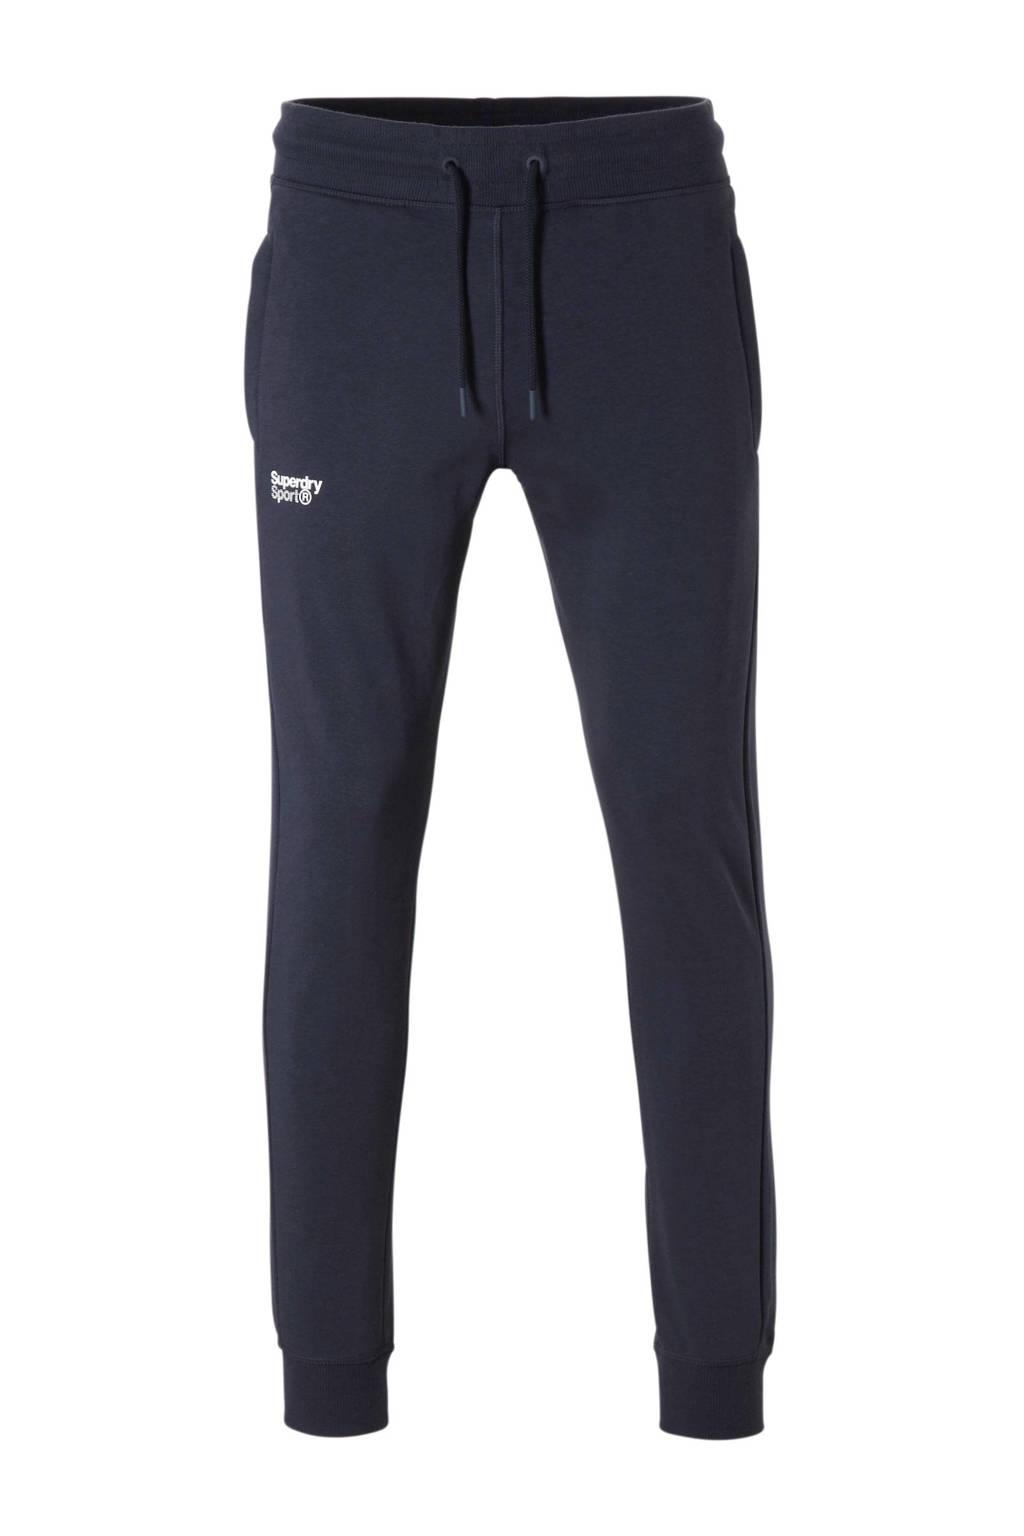 Superdry Sport joggingbroek donkerblauw, Donkerblauw